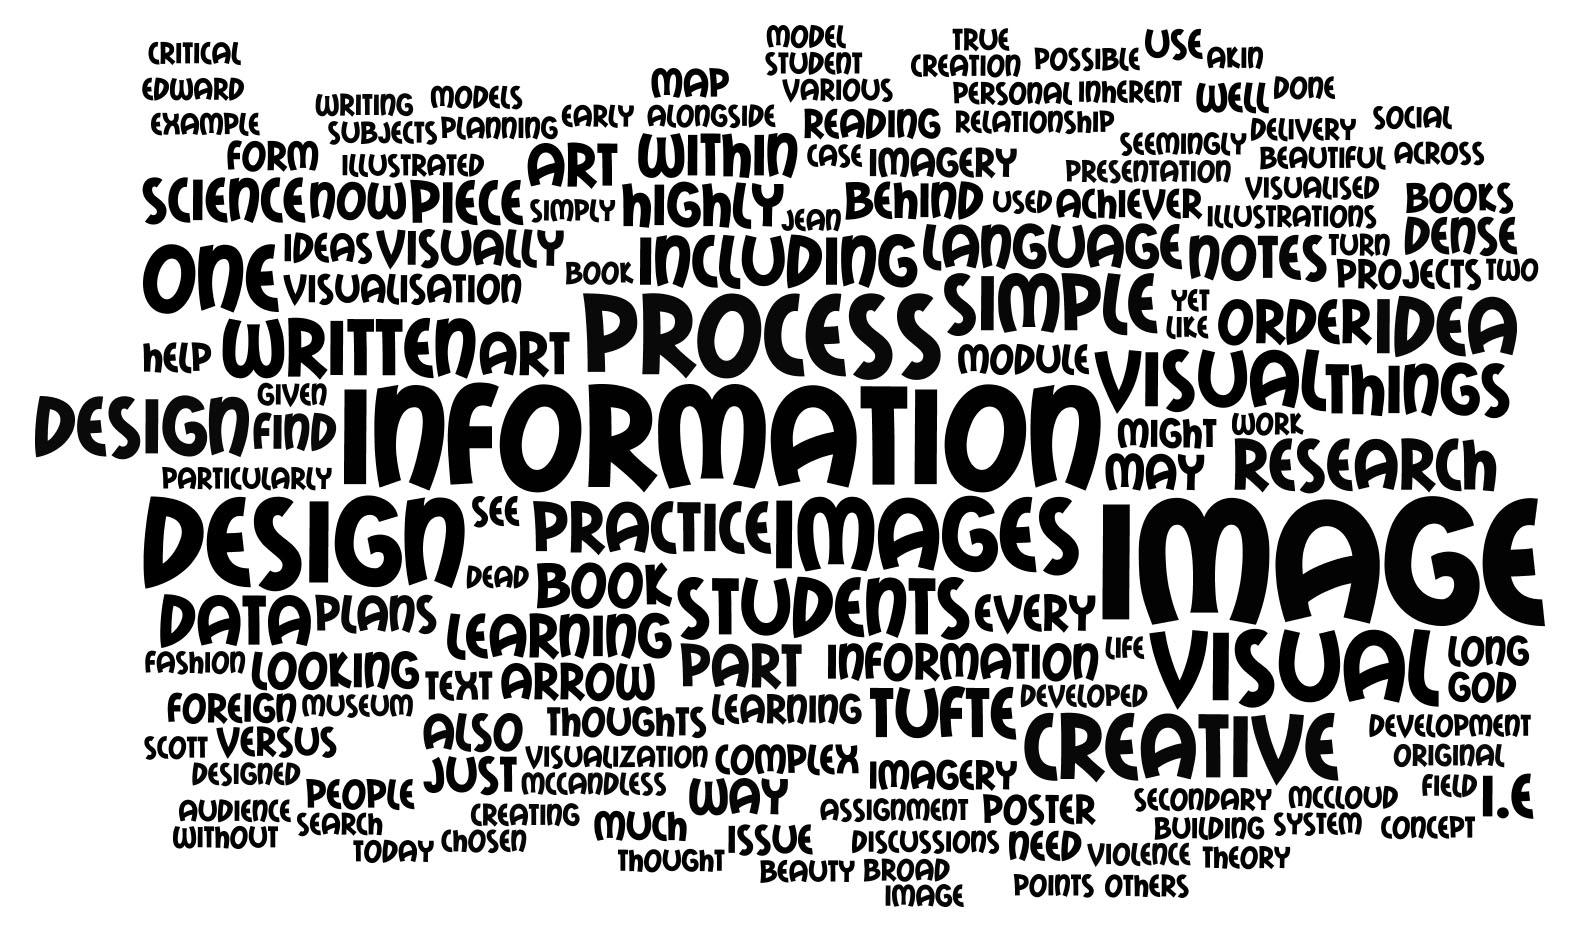 understanding the research assignment practice